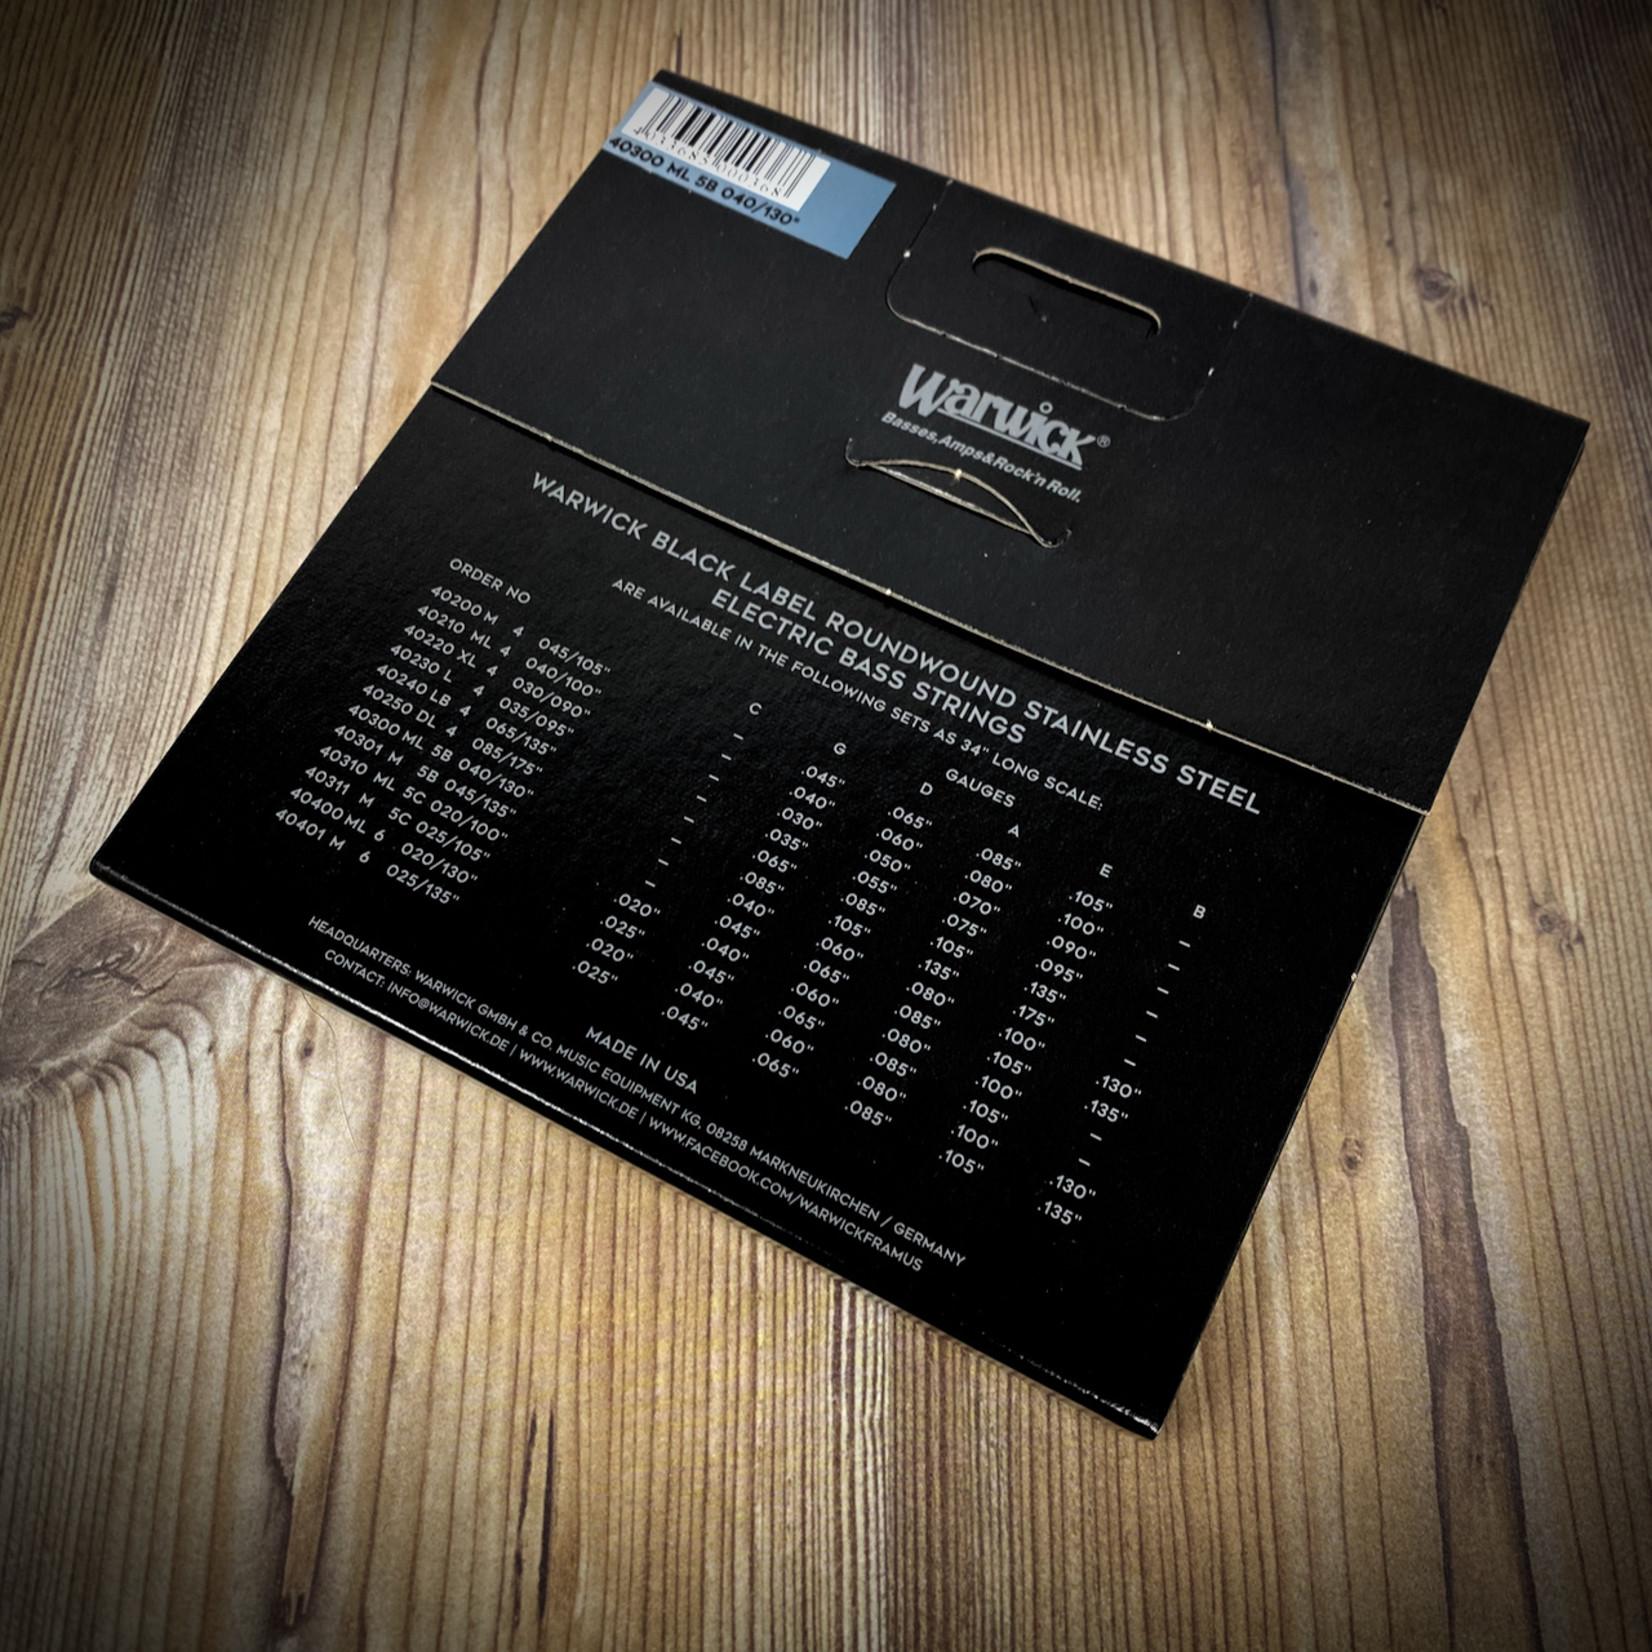 Warwick Warwick Black Label Stainless Steel Bass Strings 5-String Set (Long Scale, Low B), Medium-Light 040/130, 40300